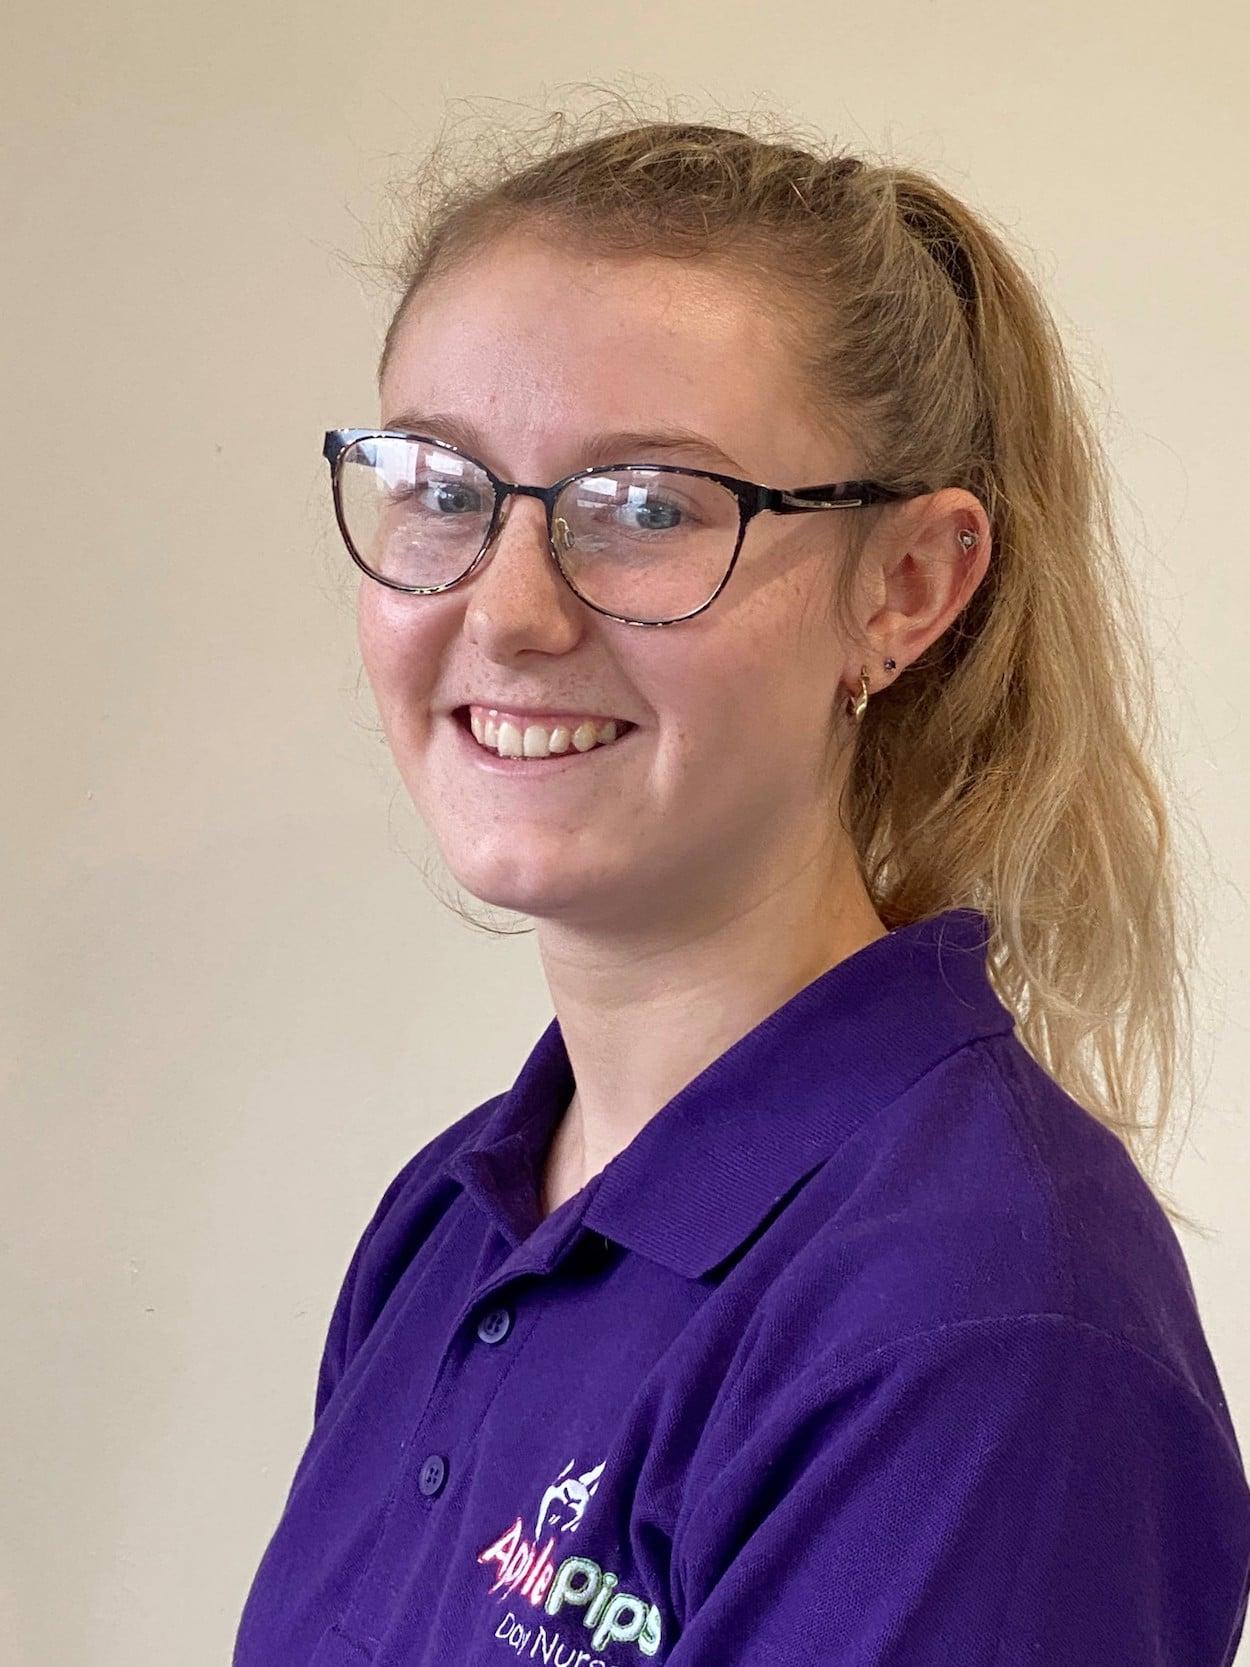 Lana - staff member at Apple Pips Day Nursery Rustington